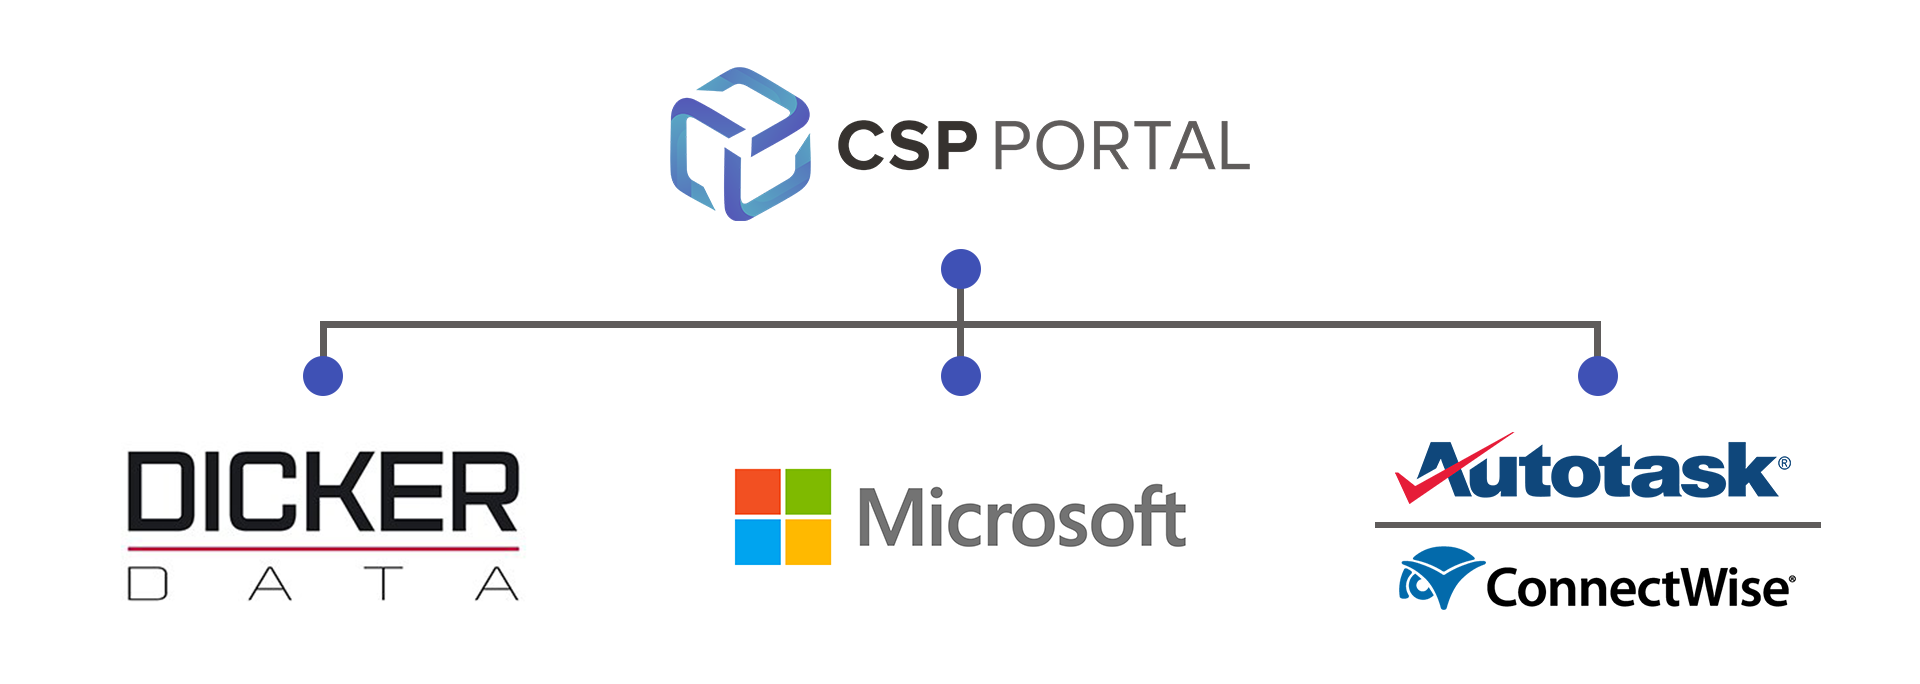 CSP Portal Linking